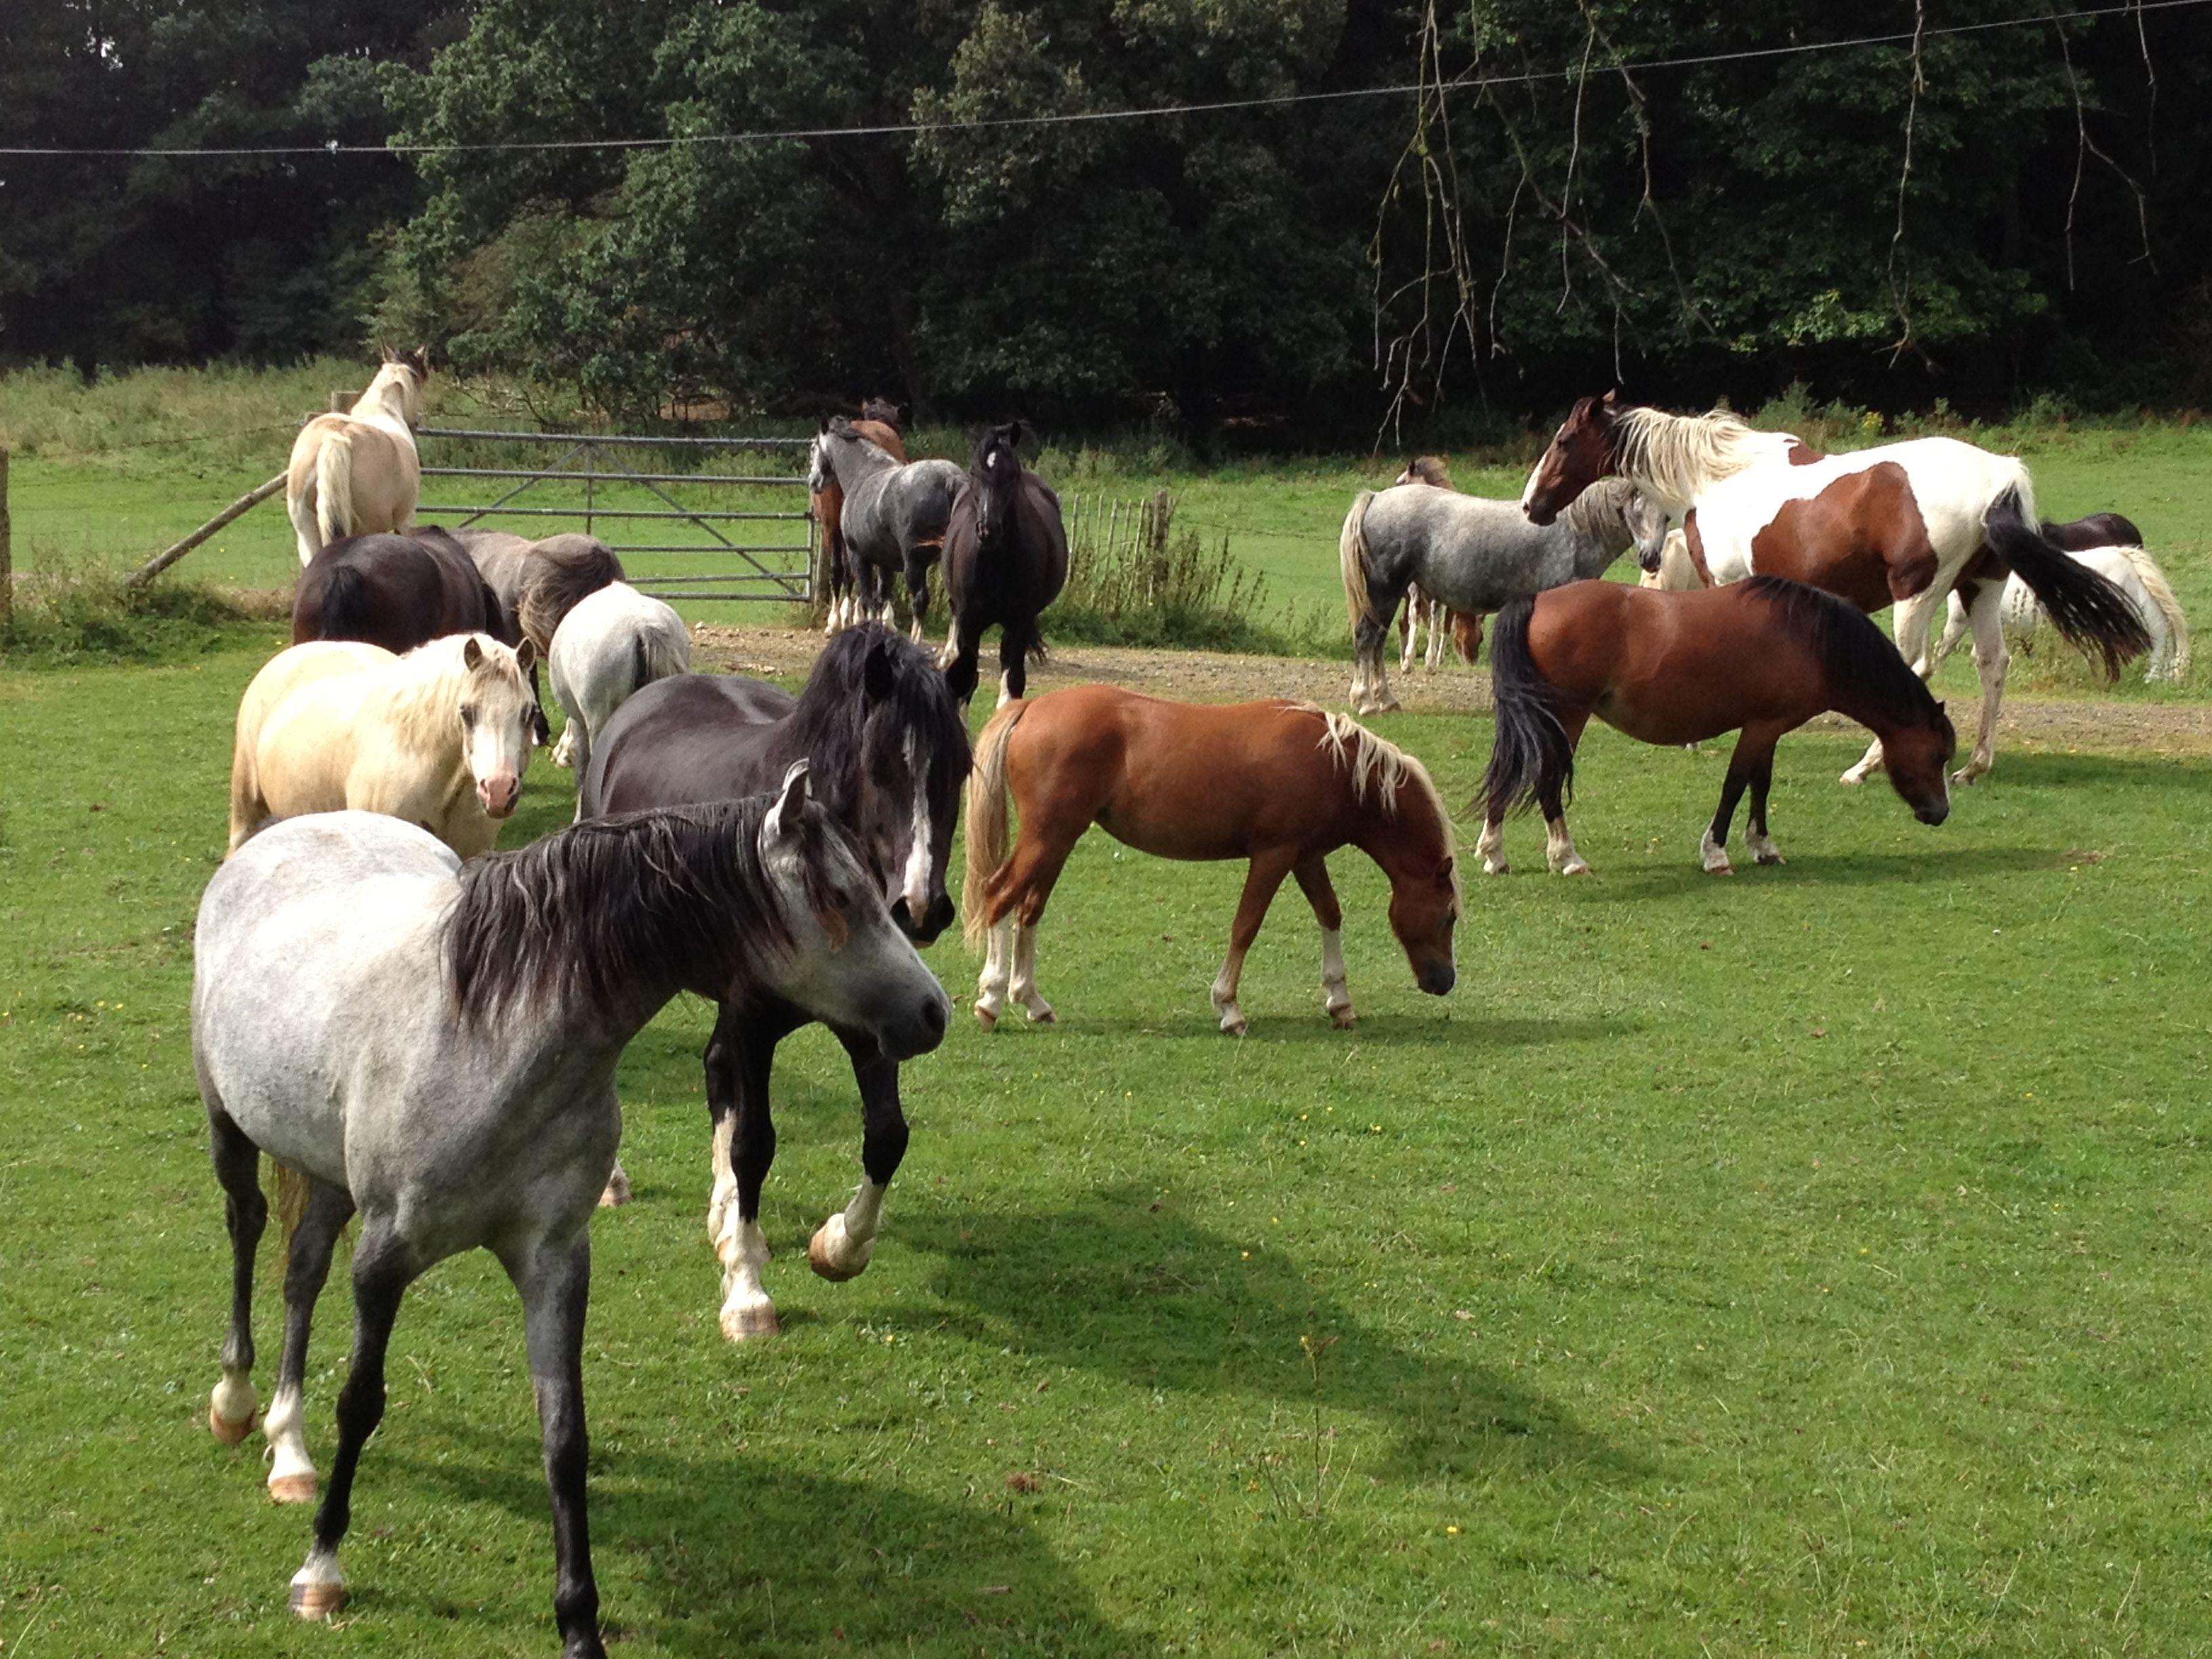 Herd of horses in Park Farm land in Gerrads Cross England | Out in ...